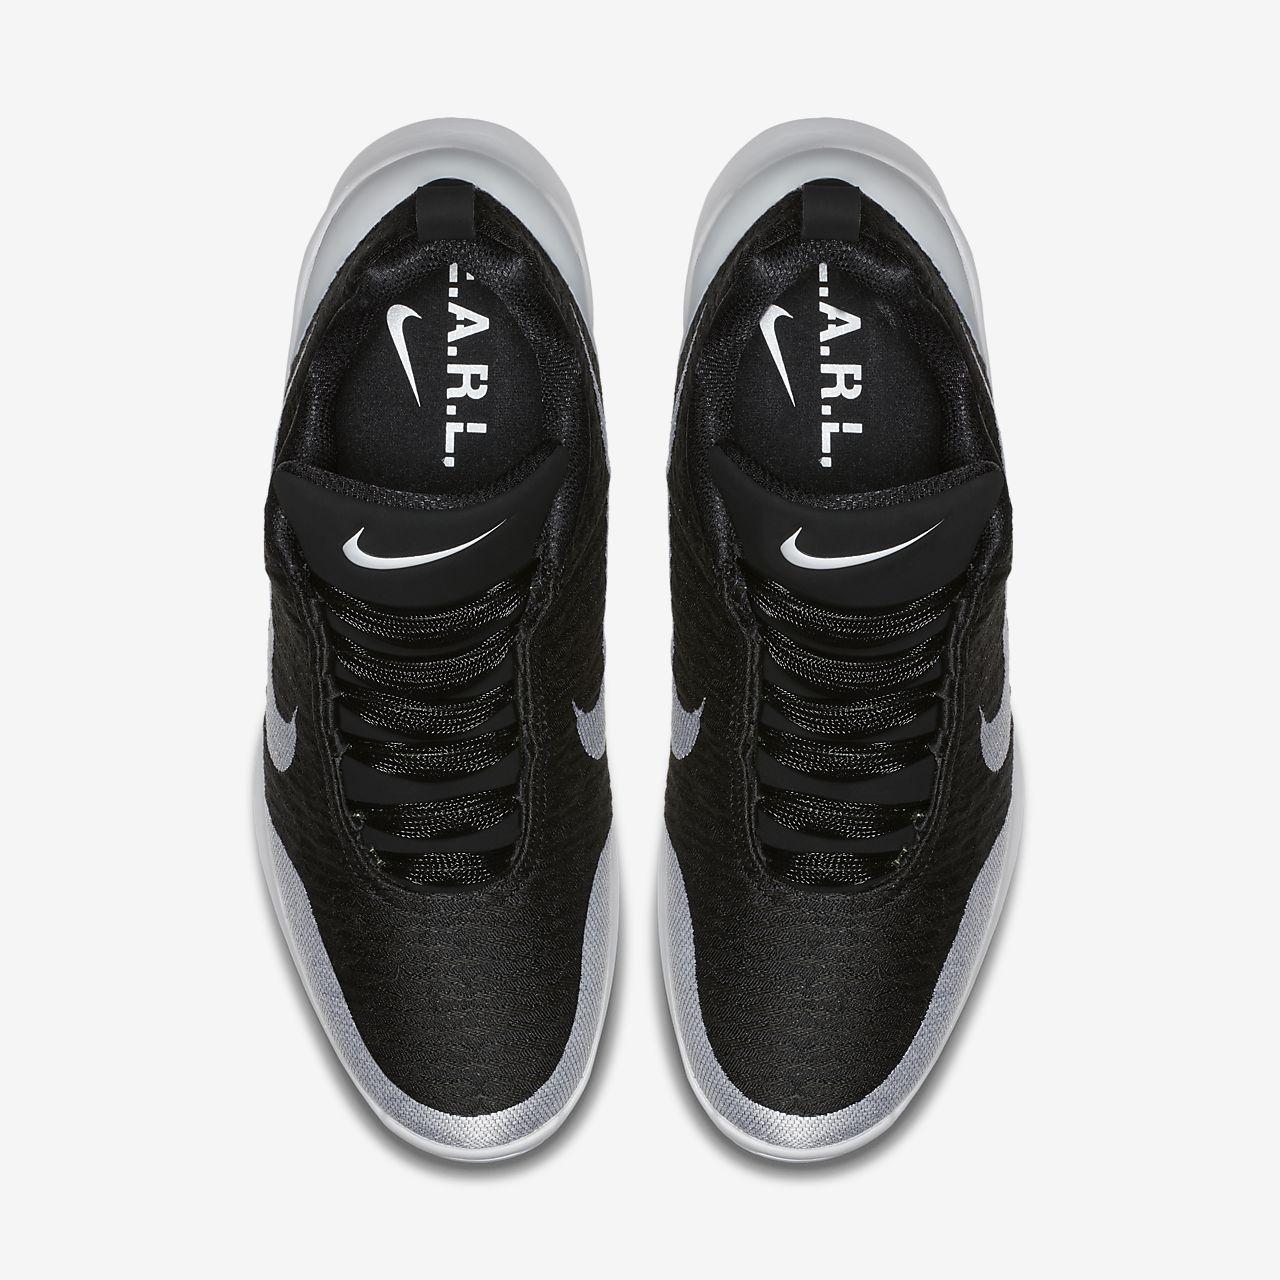 59fef3a81ebc8 Nike HyperAdapt 1.0 (UK Plug) Men's Shoe. Nike.com GB